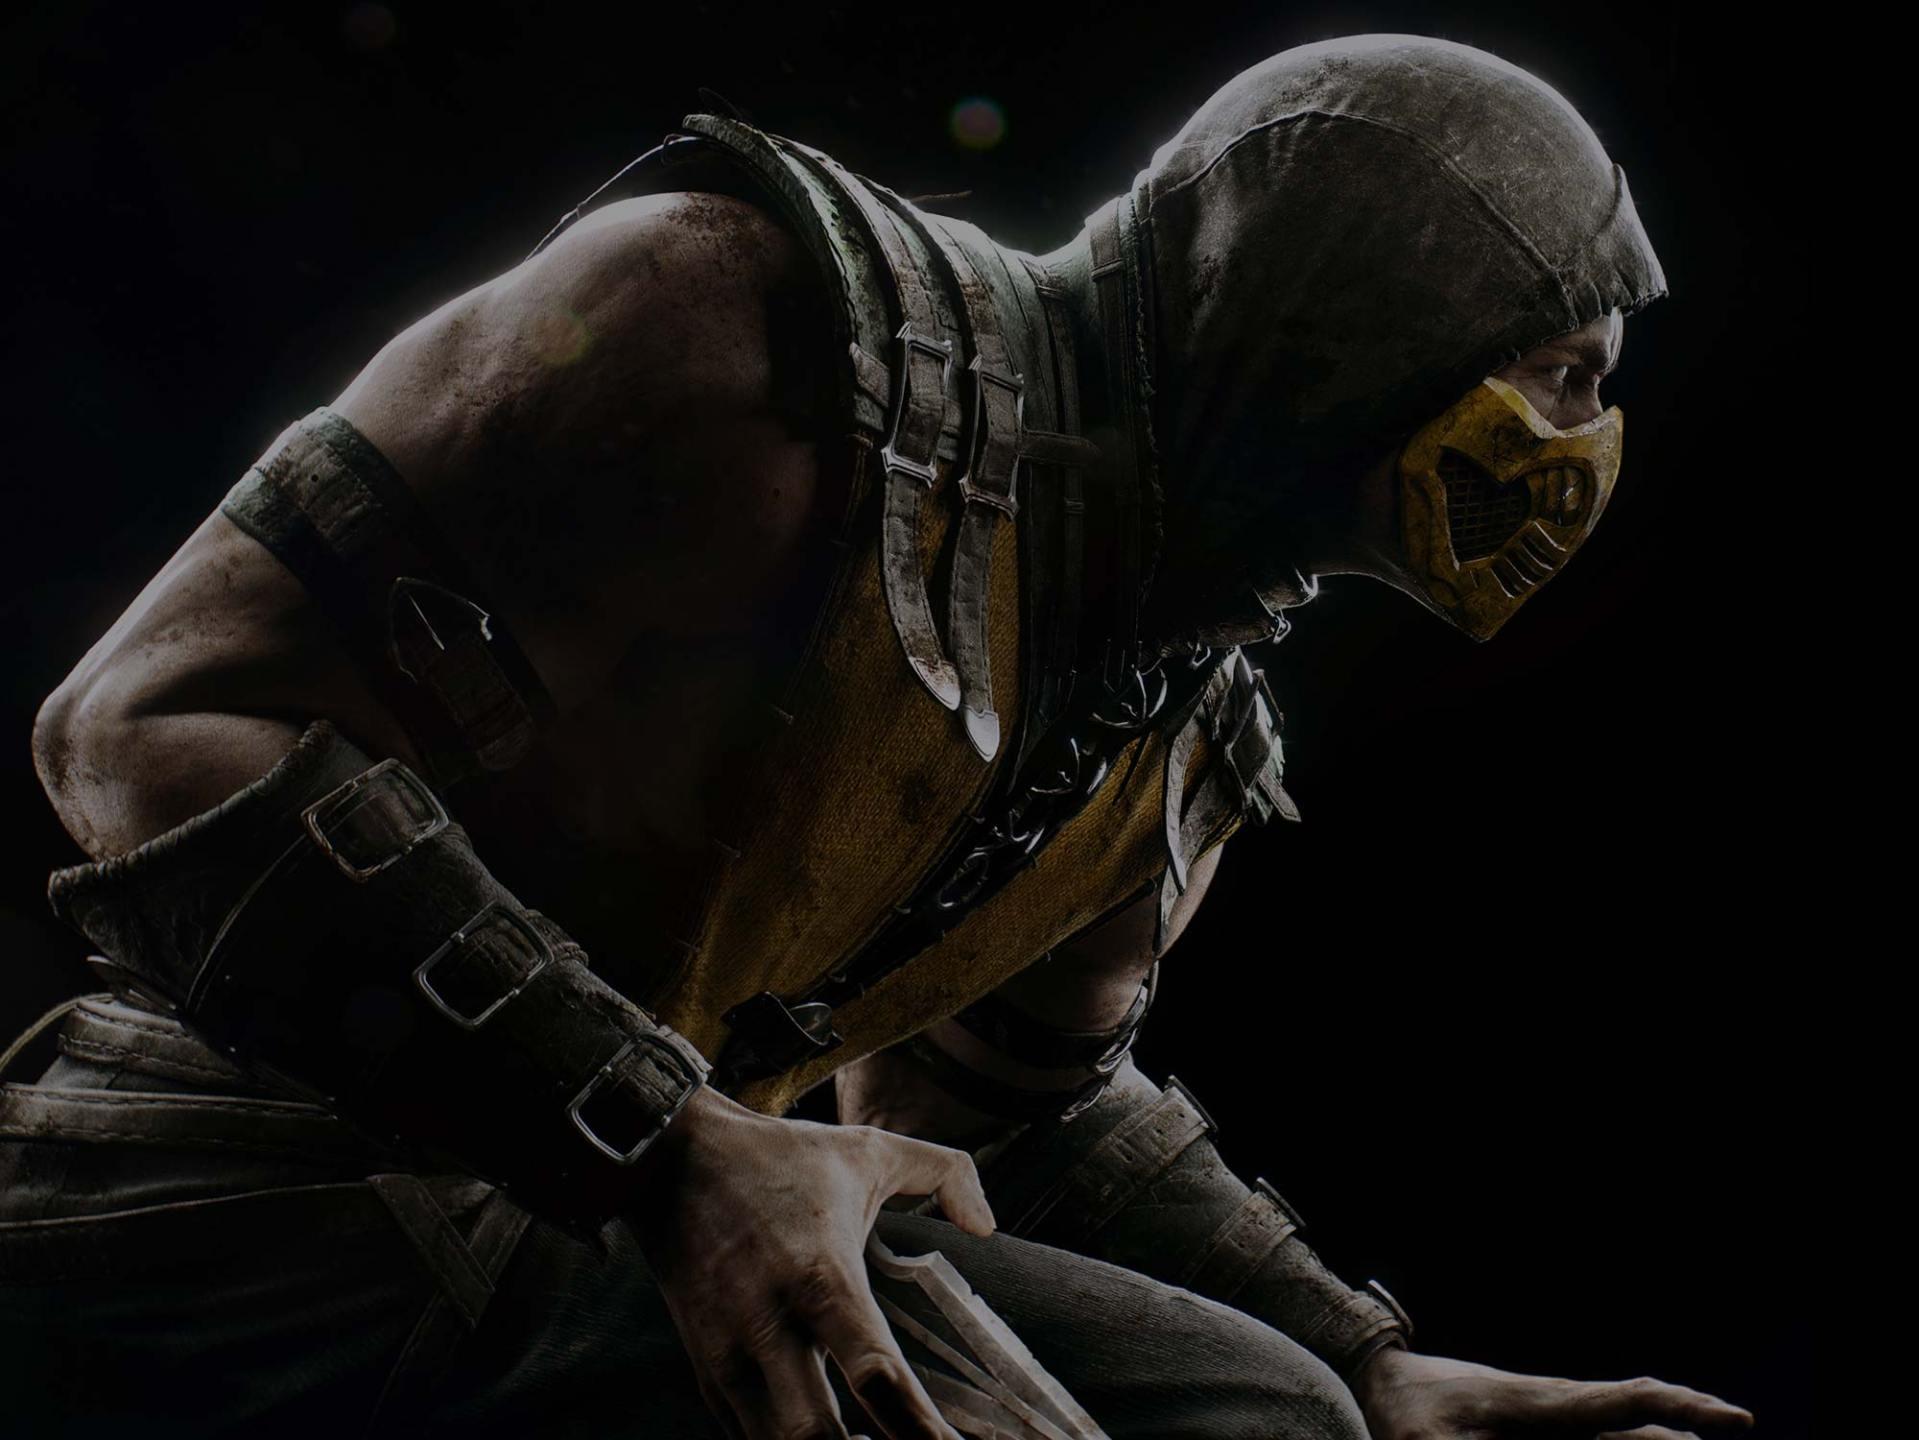 Mortal Kombat X Launch Trailer